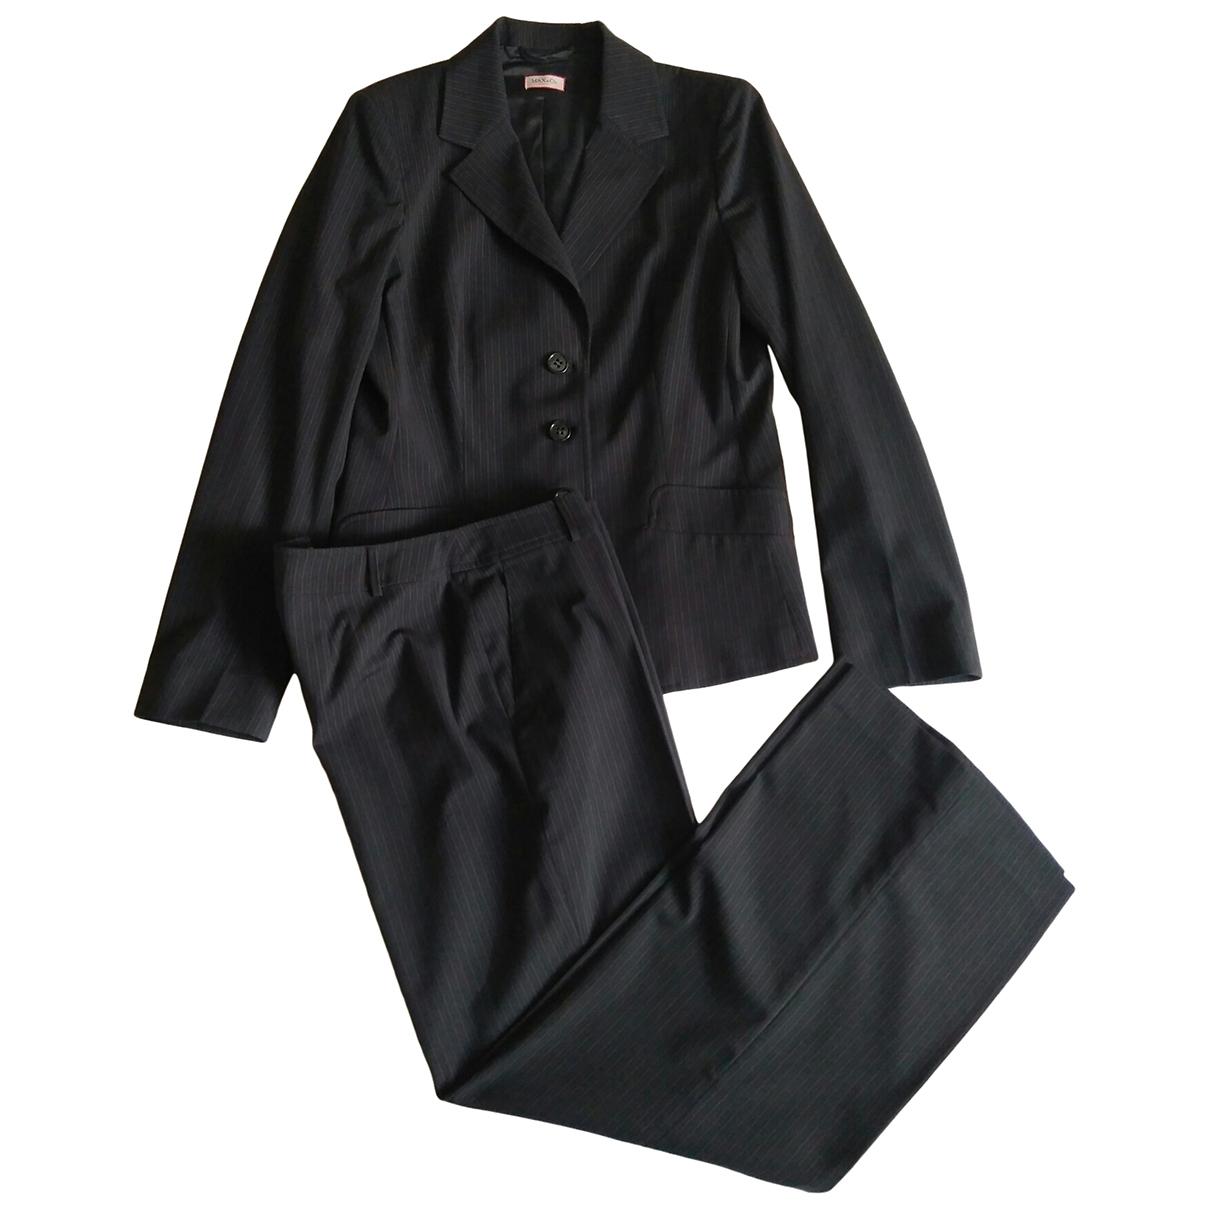 Max & Co \N Grey jacket for Women 46 FR